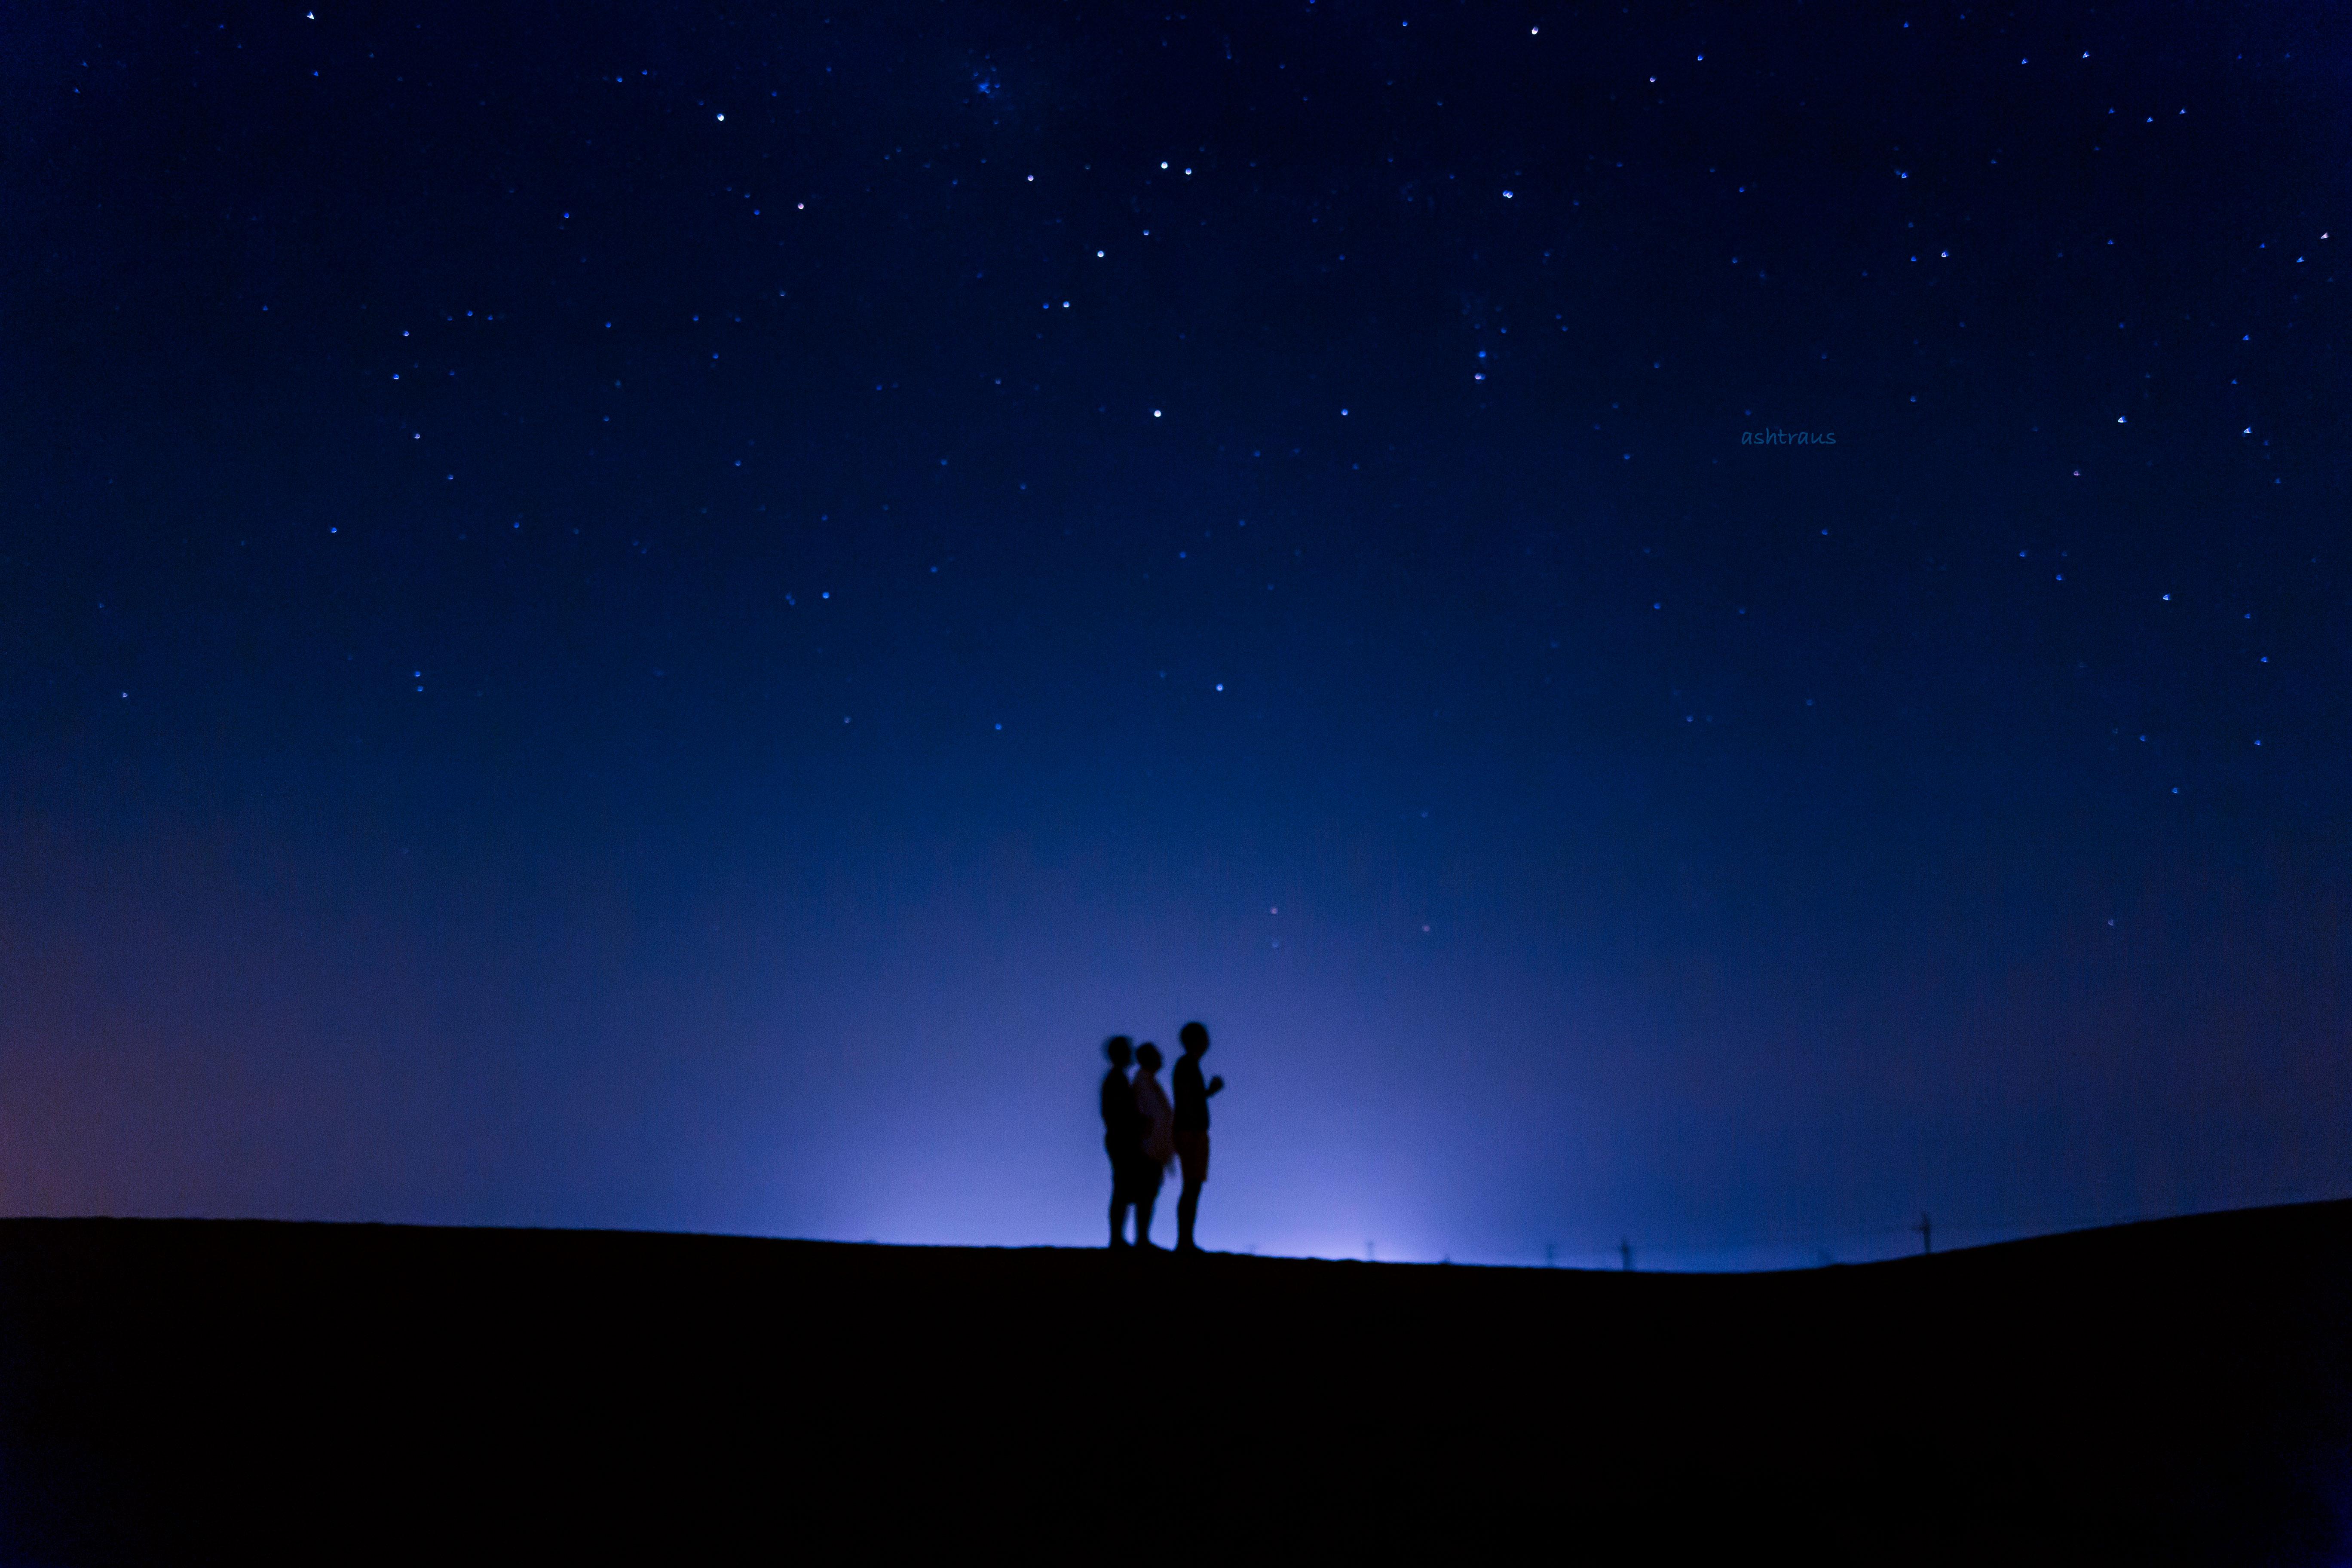 Amazing Wallpaper Night Dark - sky-people-night-dark-stars-lights-star-Dubai-skies-desert-comet-meteor-meteors-stargazing-meteorshower-constelations-970305  Trends.jpg